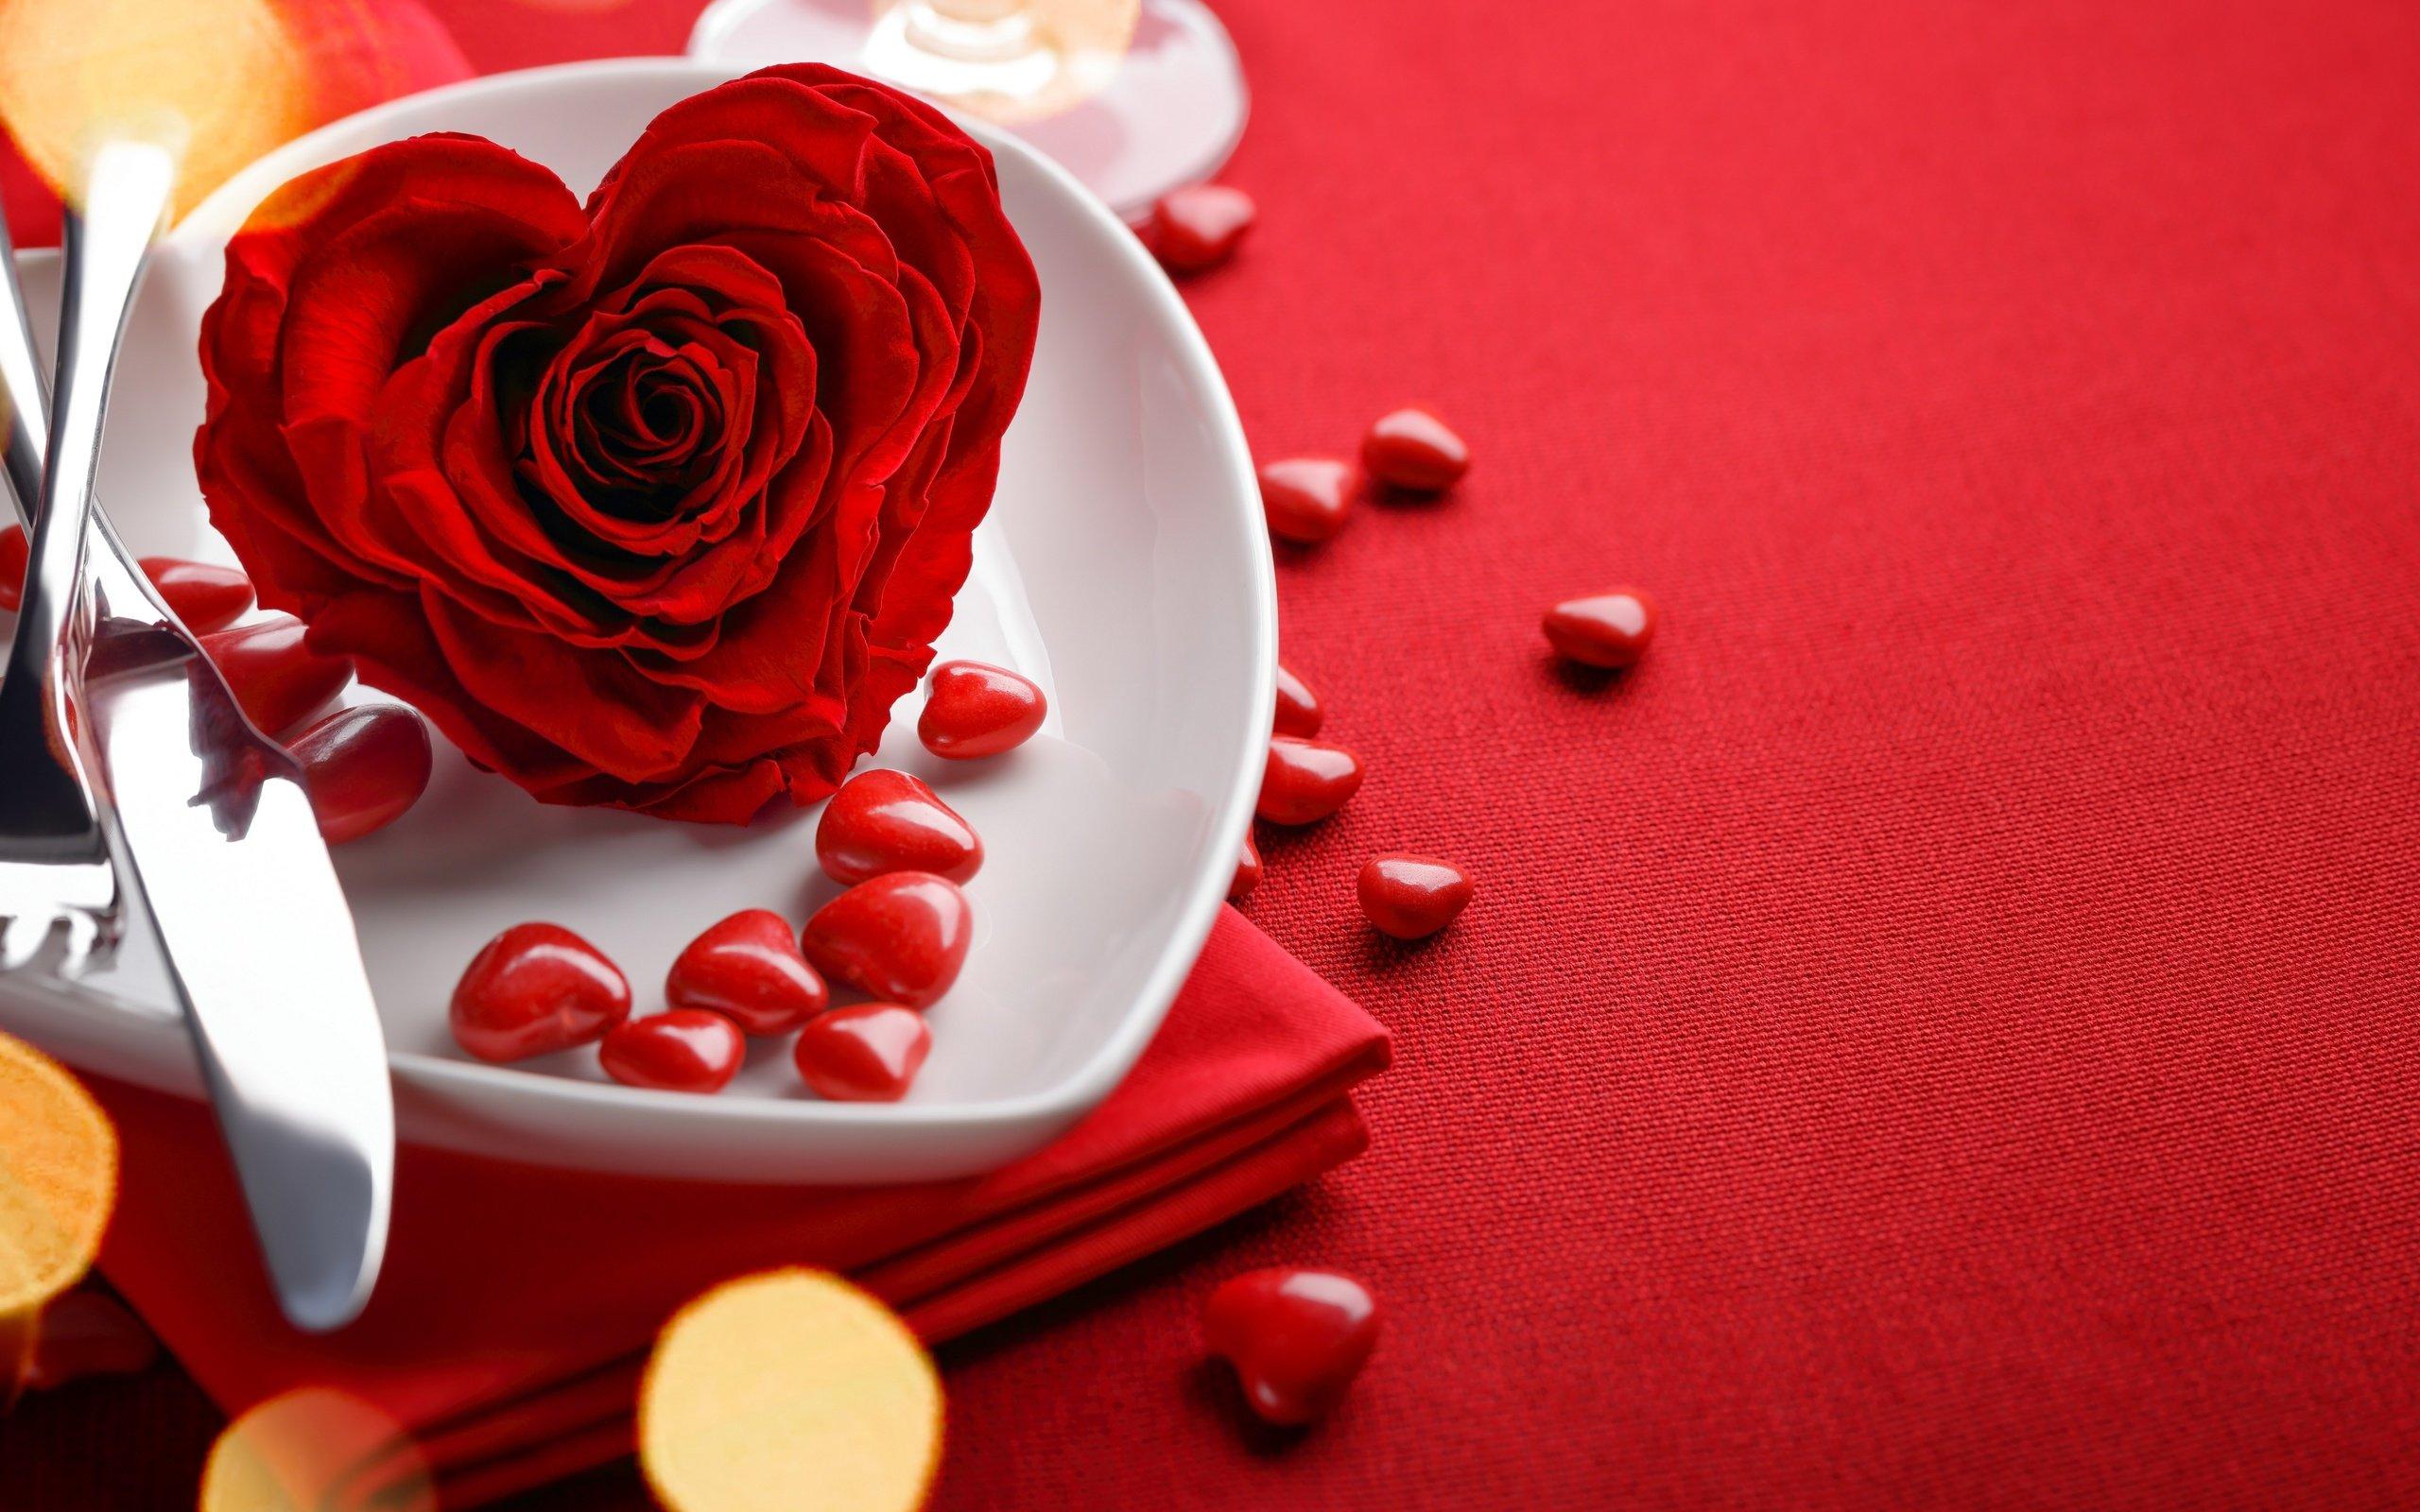 Романтических открыток, декупаж картинки